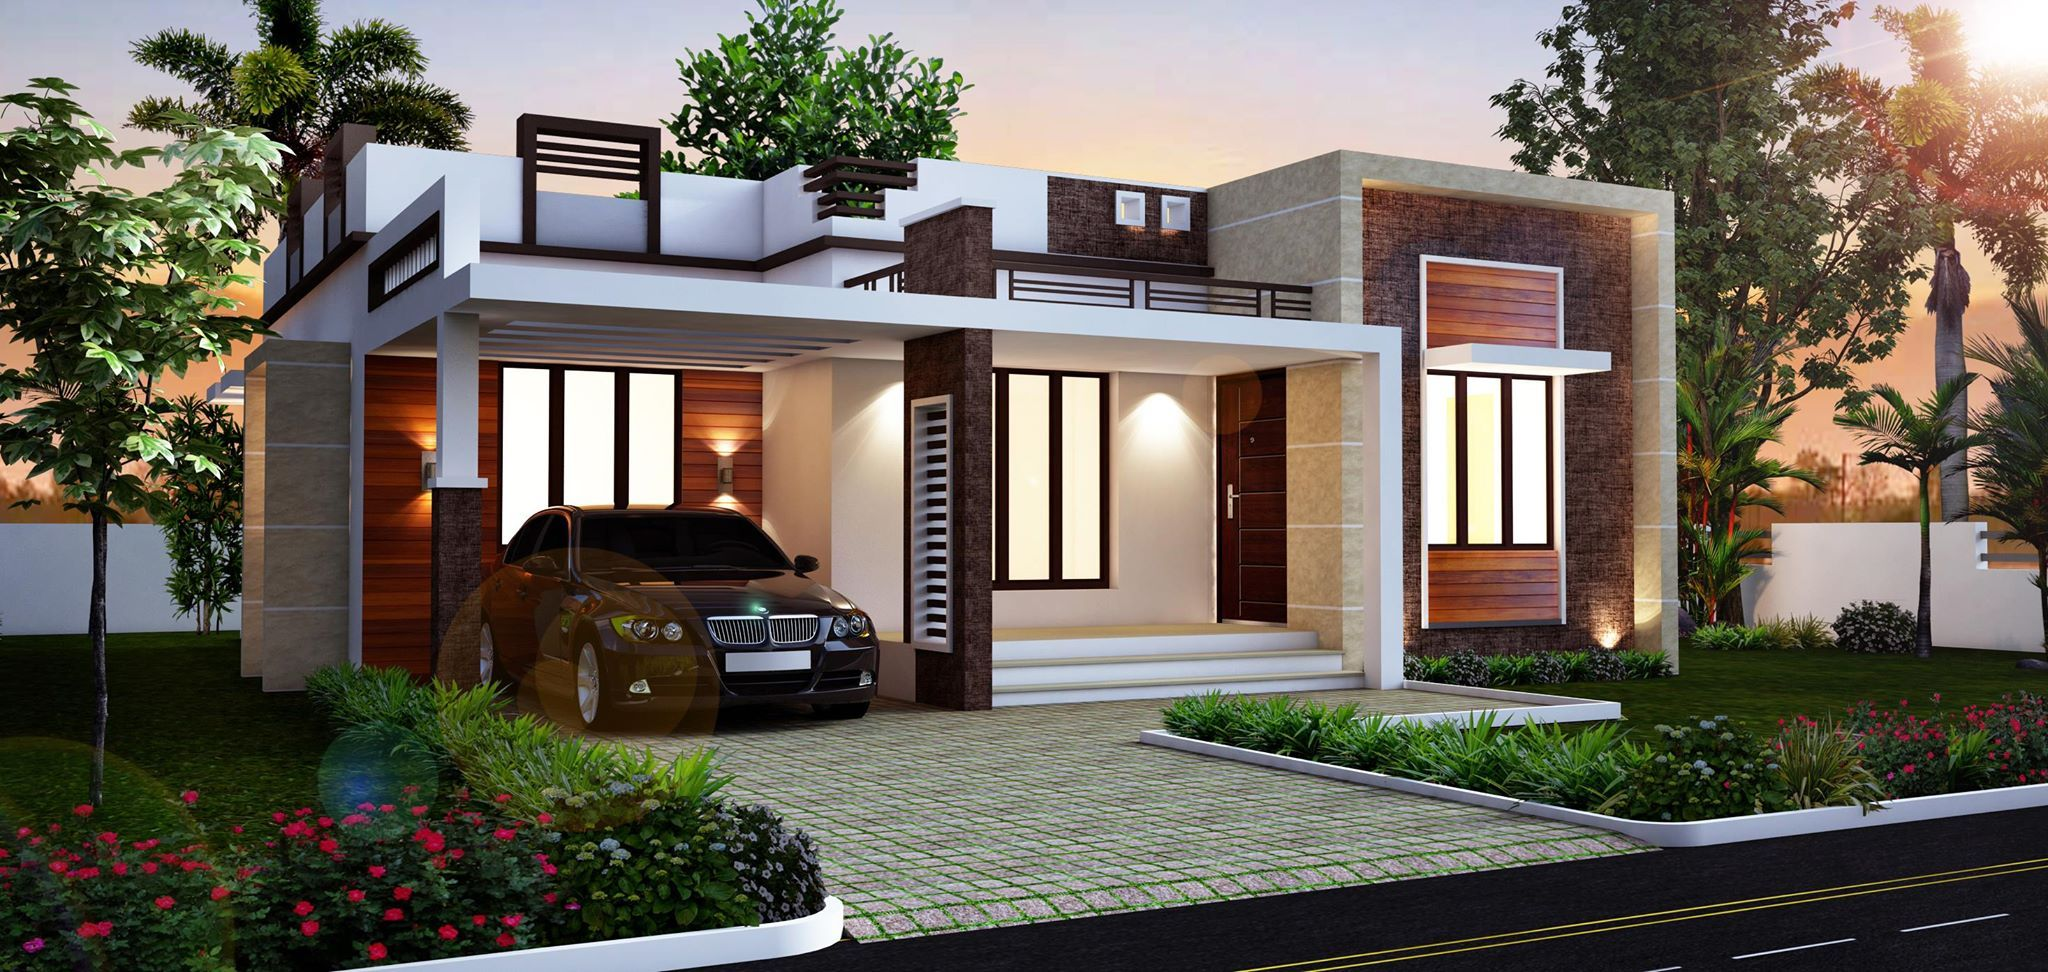 Beautiful Models Of Houses